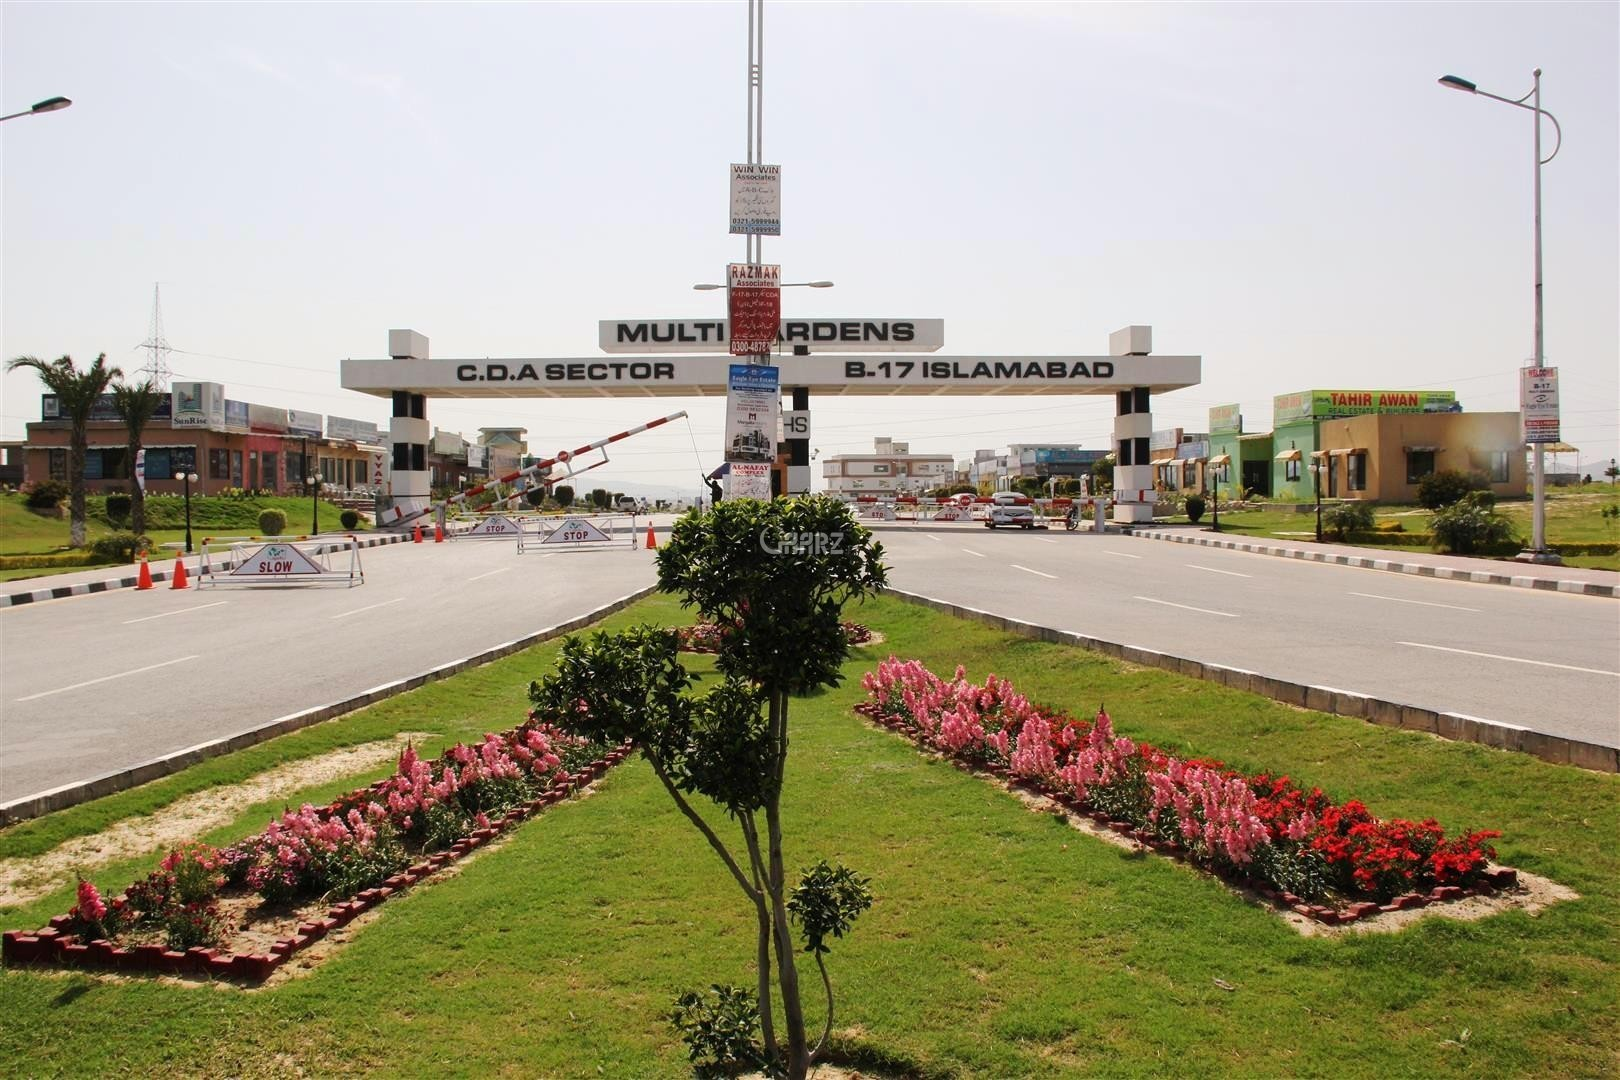 14 Marla Plot in B-17, Islamabad for Sale